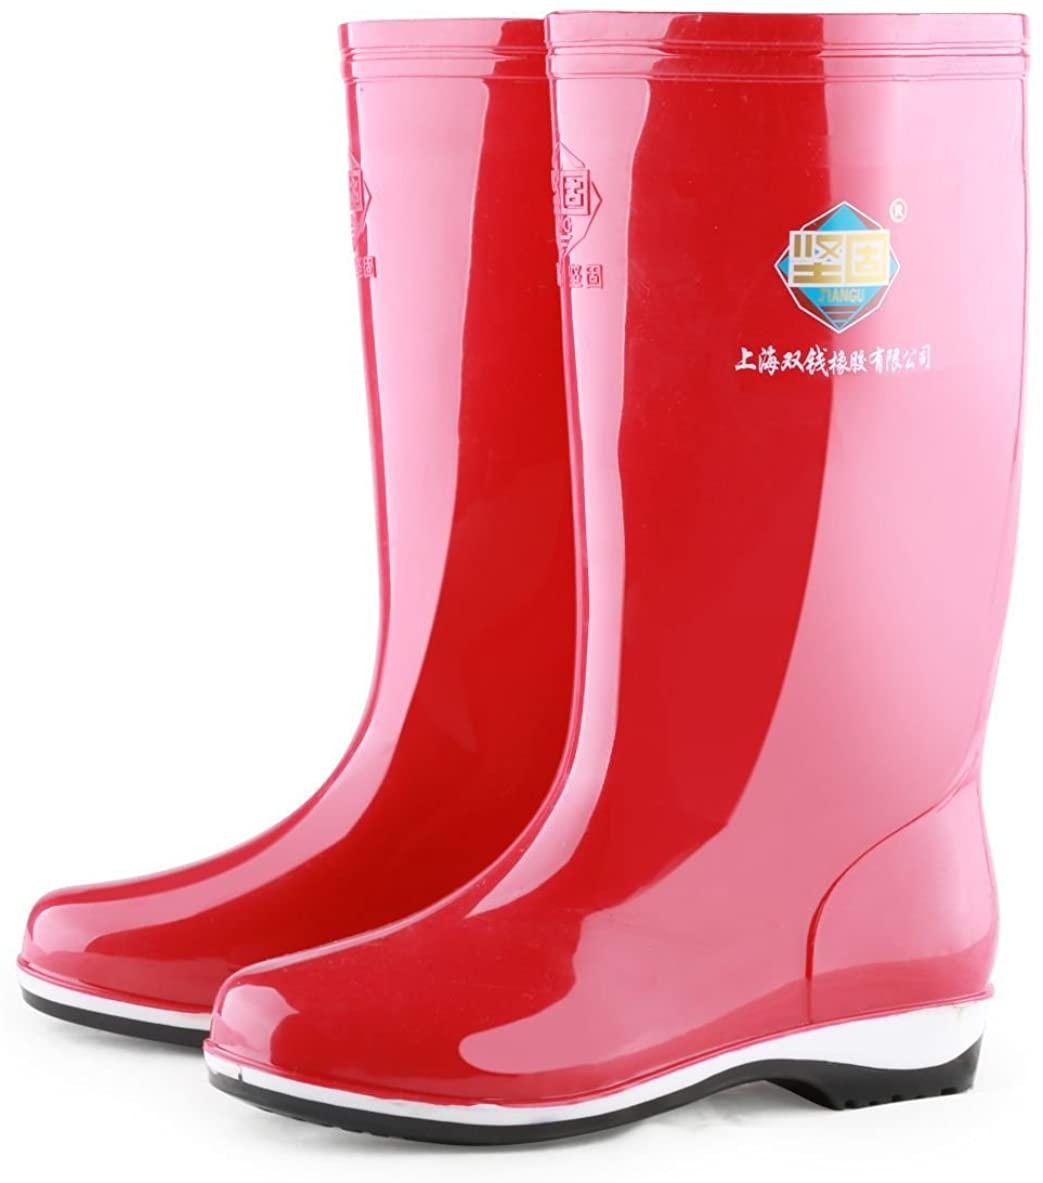 PVC Rain Shoes Womens Rain Boot, Size9, Red